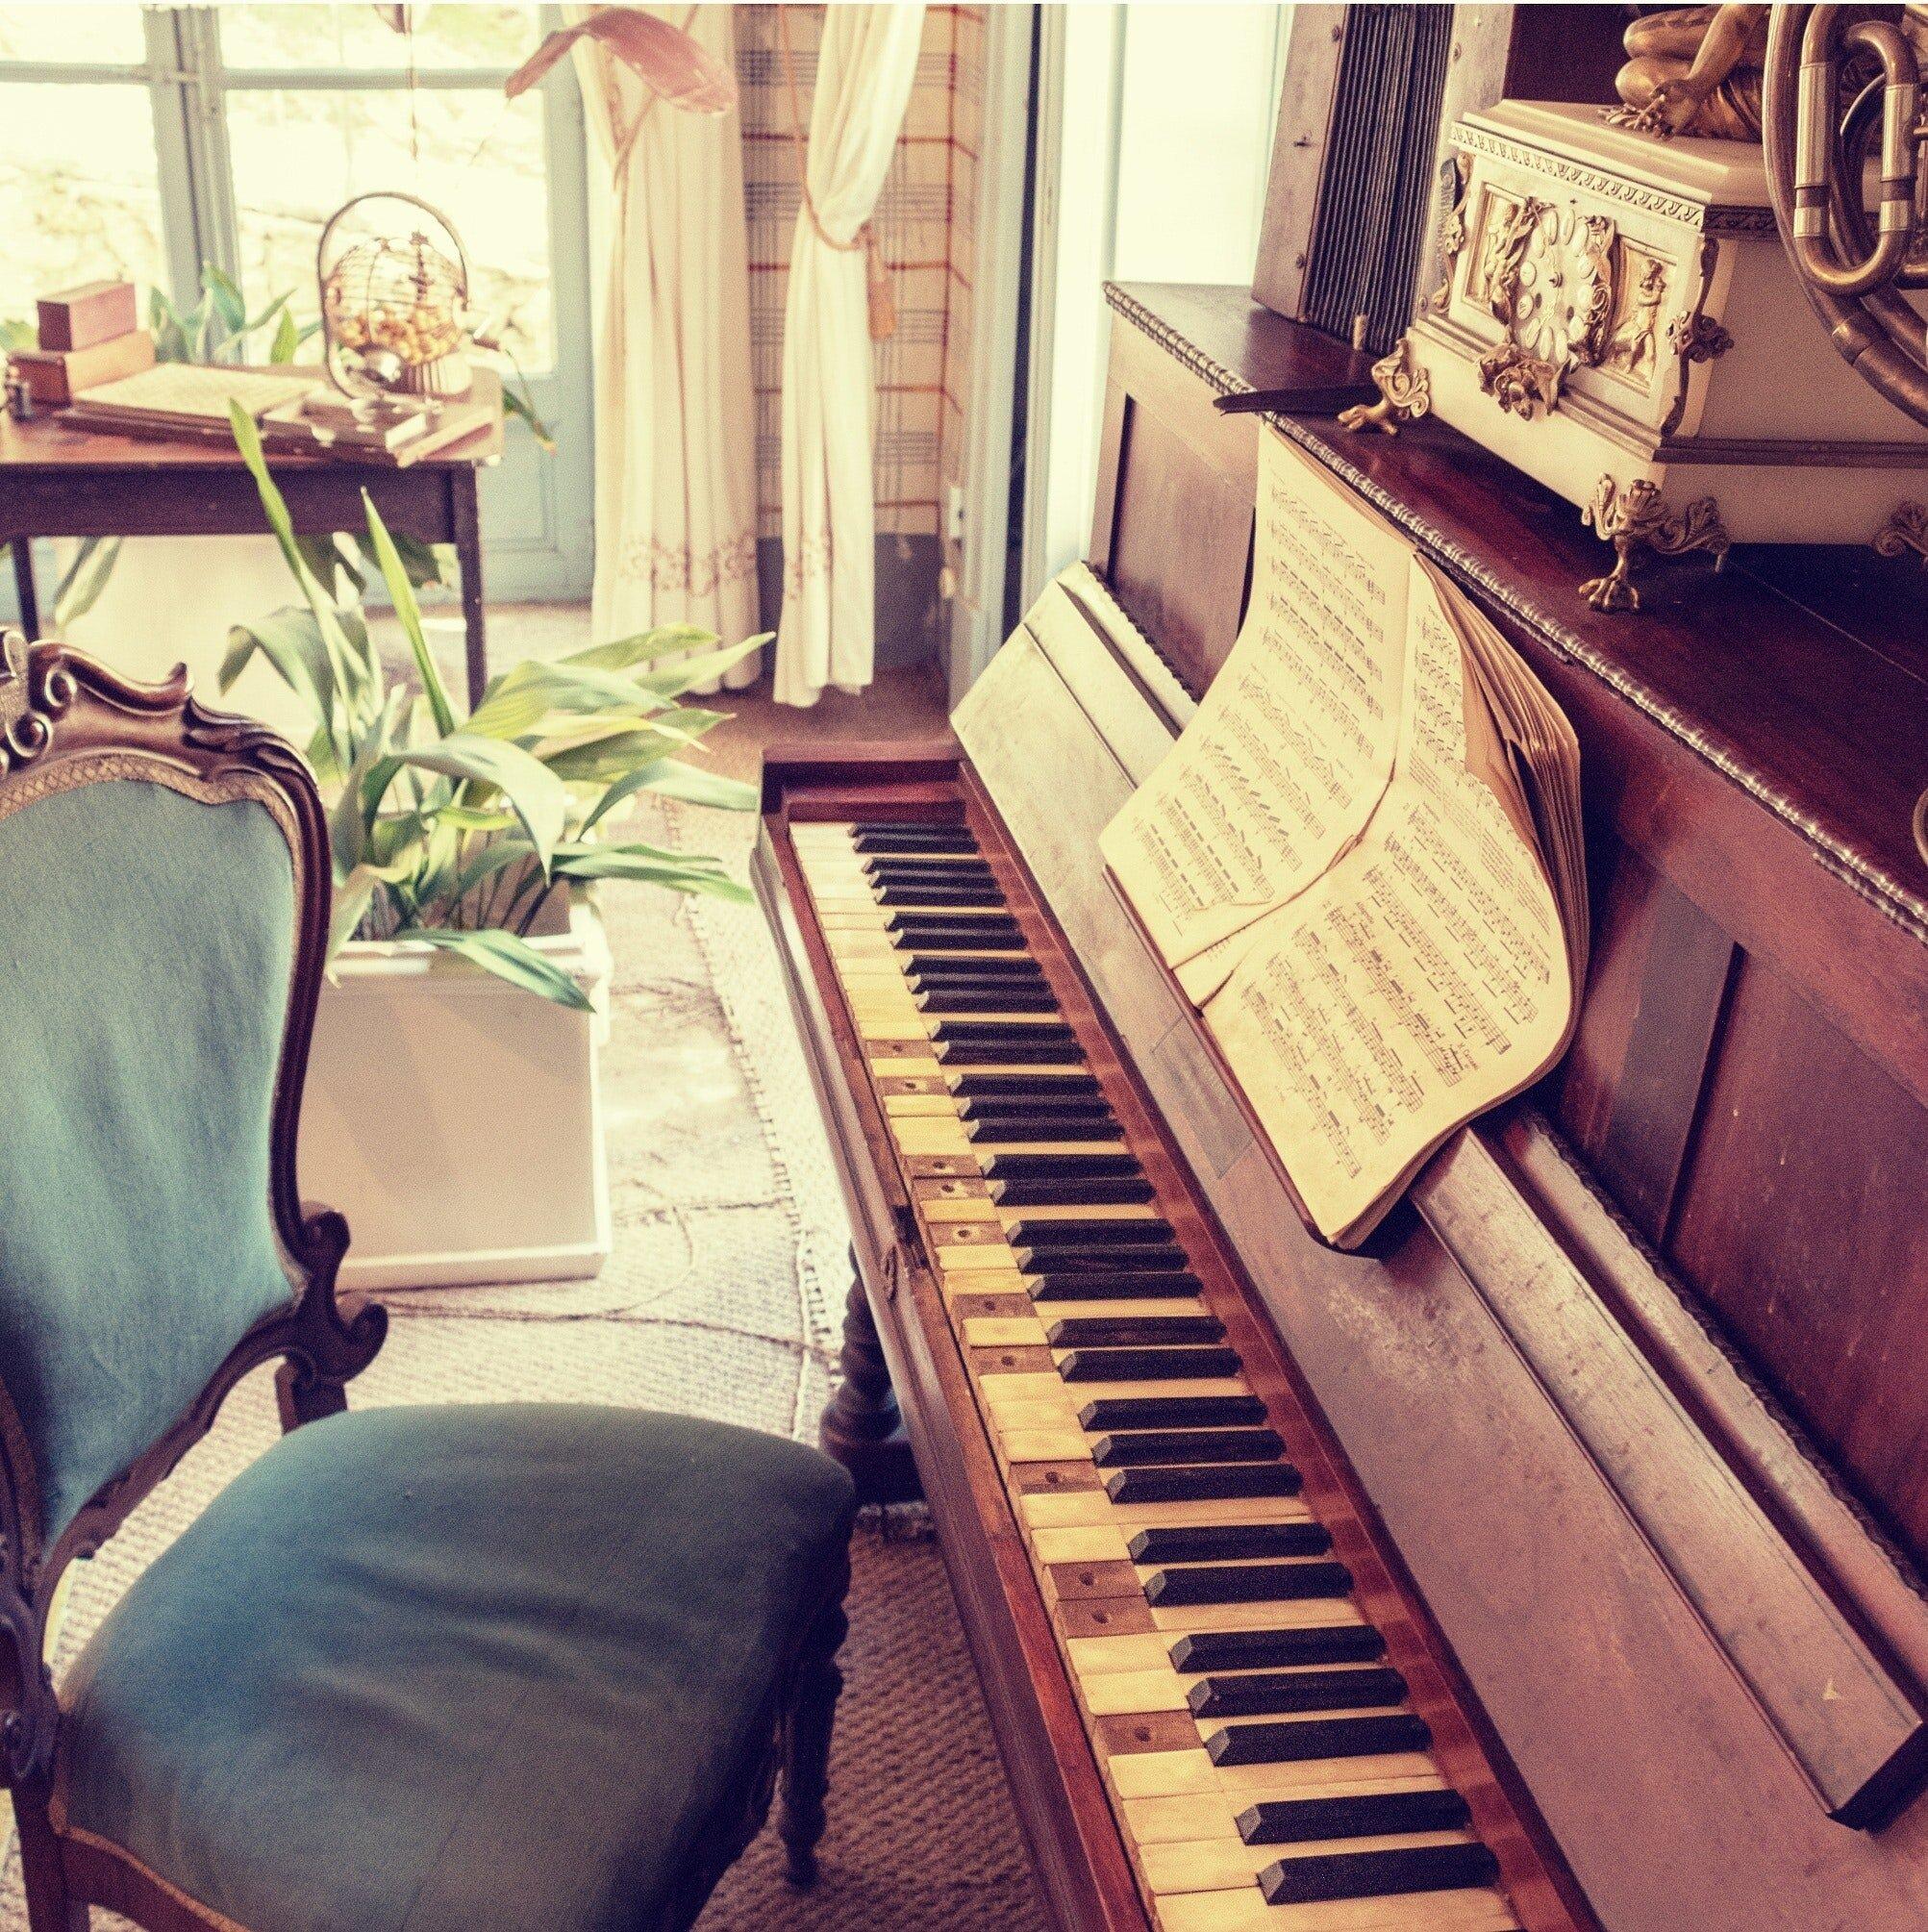 chair-music-musical-instrument-237469.jpg